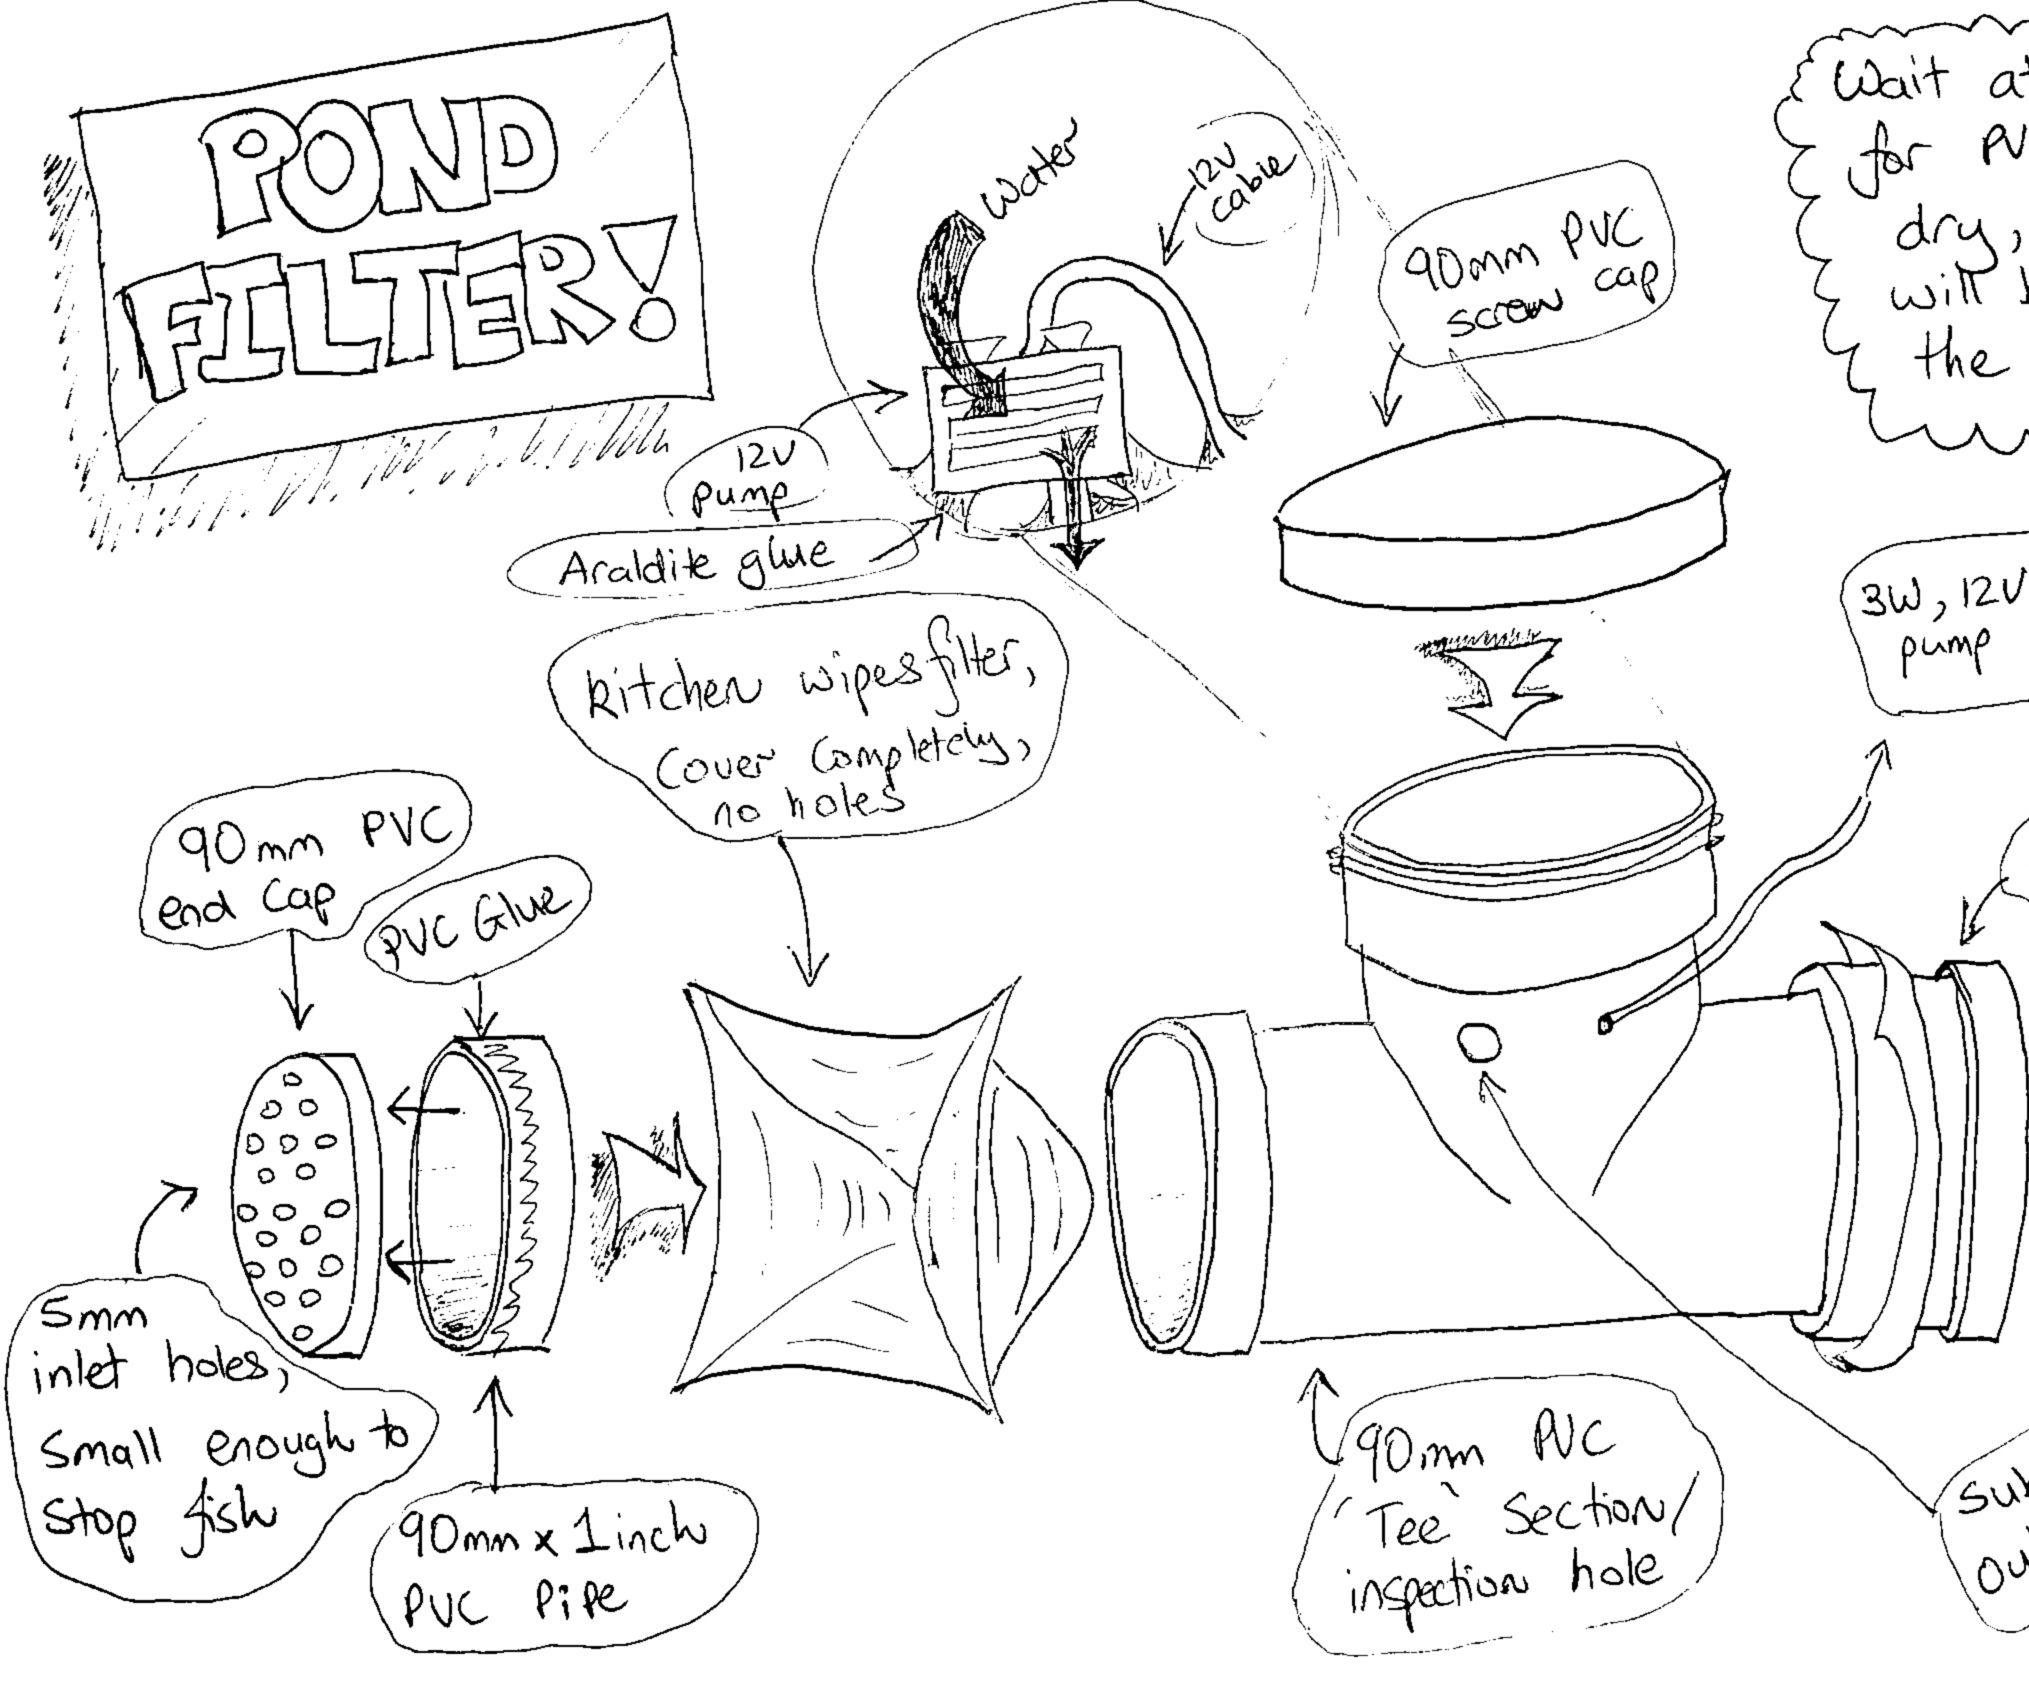 DIY Small Pond Filer